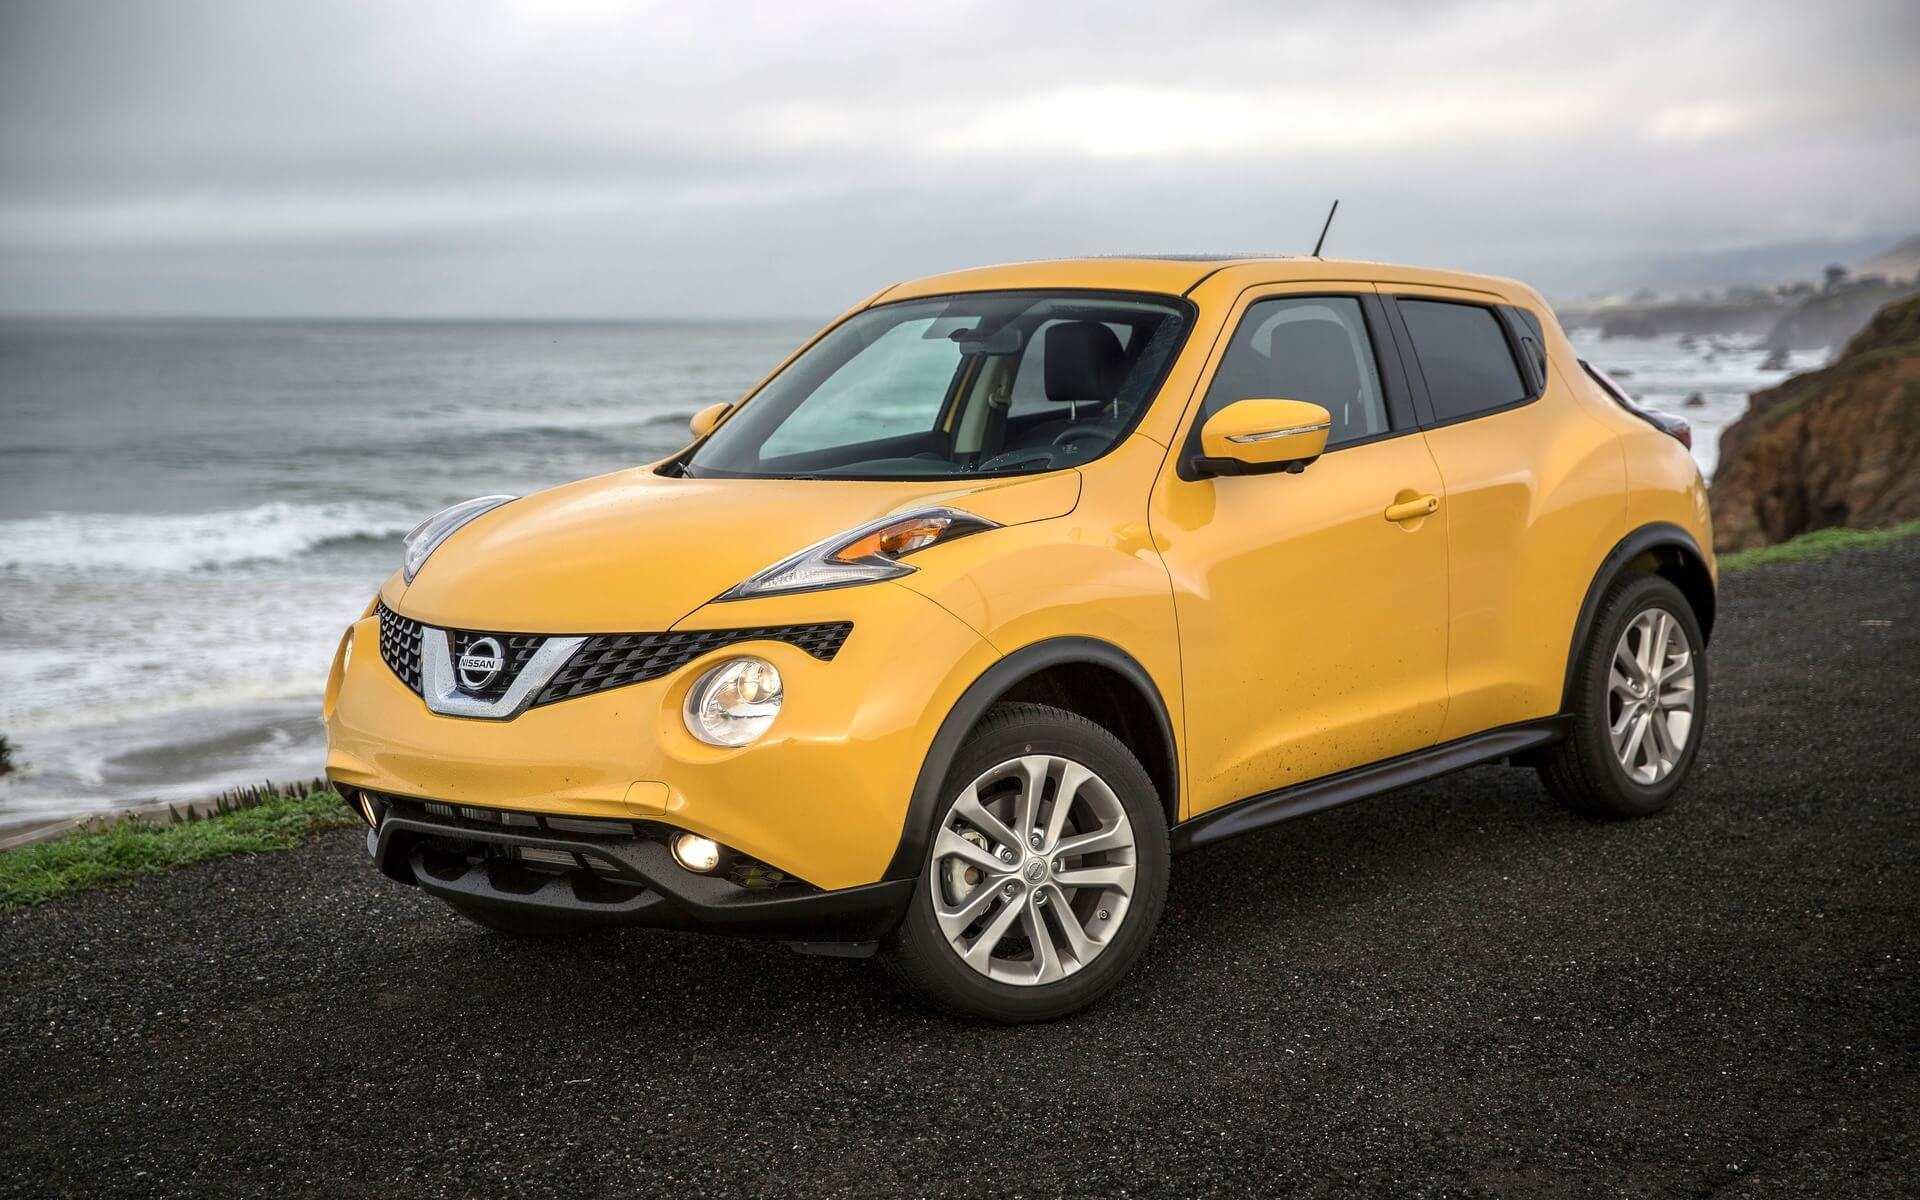 56 New 2020 Nissan Juke Exterior Concept with 2020 Nissan Juke Exterior